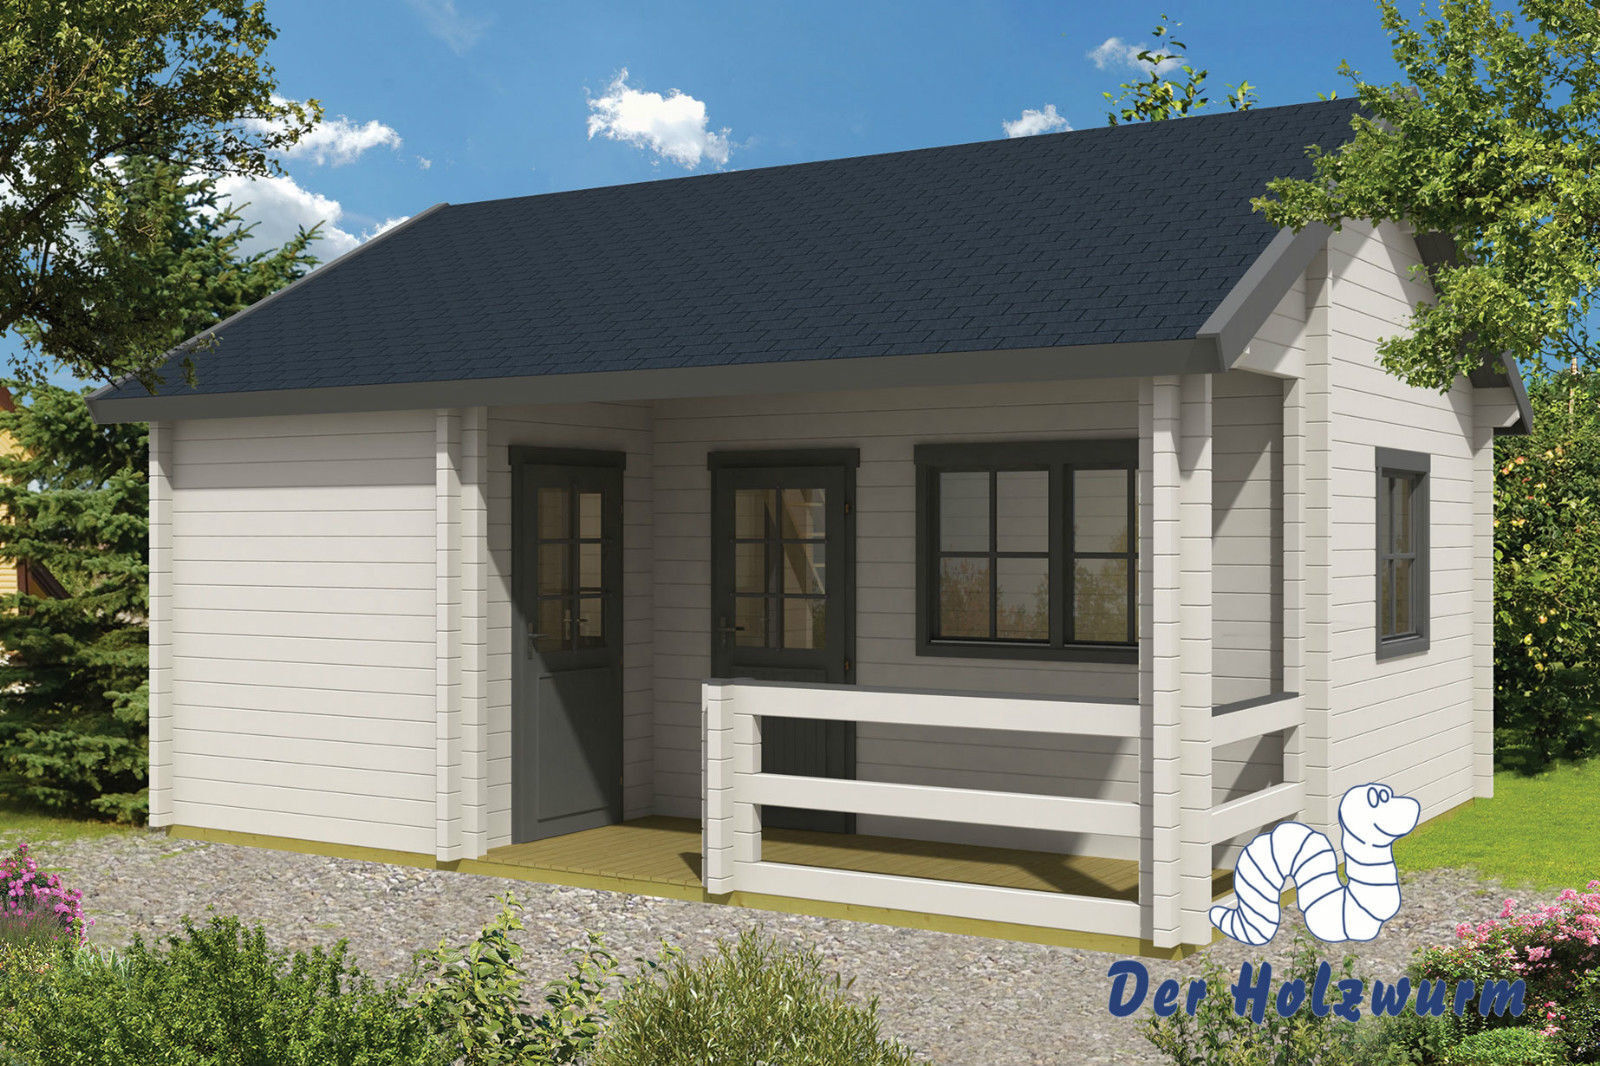 70 mm gartenhaus 600x510cm blockhaus ferienhaus holzhaus holz h tte b ro ebay. Black Bedroom Furniture Sets. Home Design Ideas